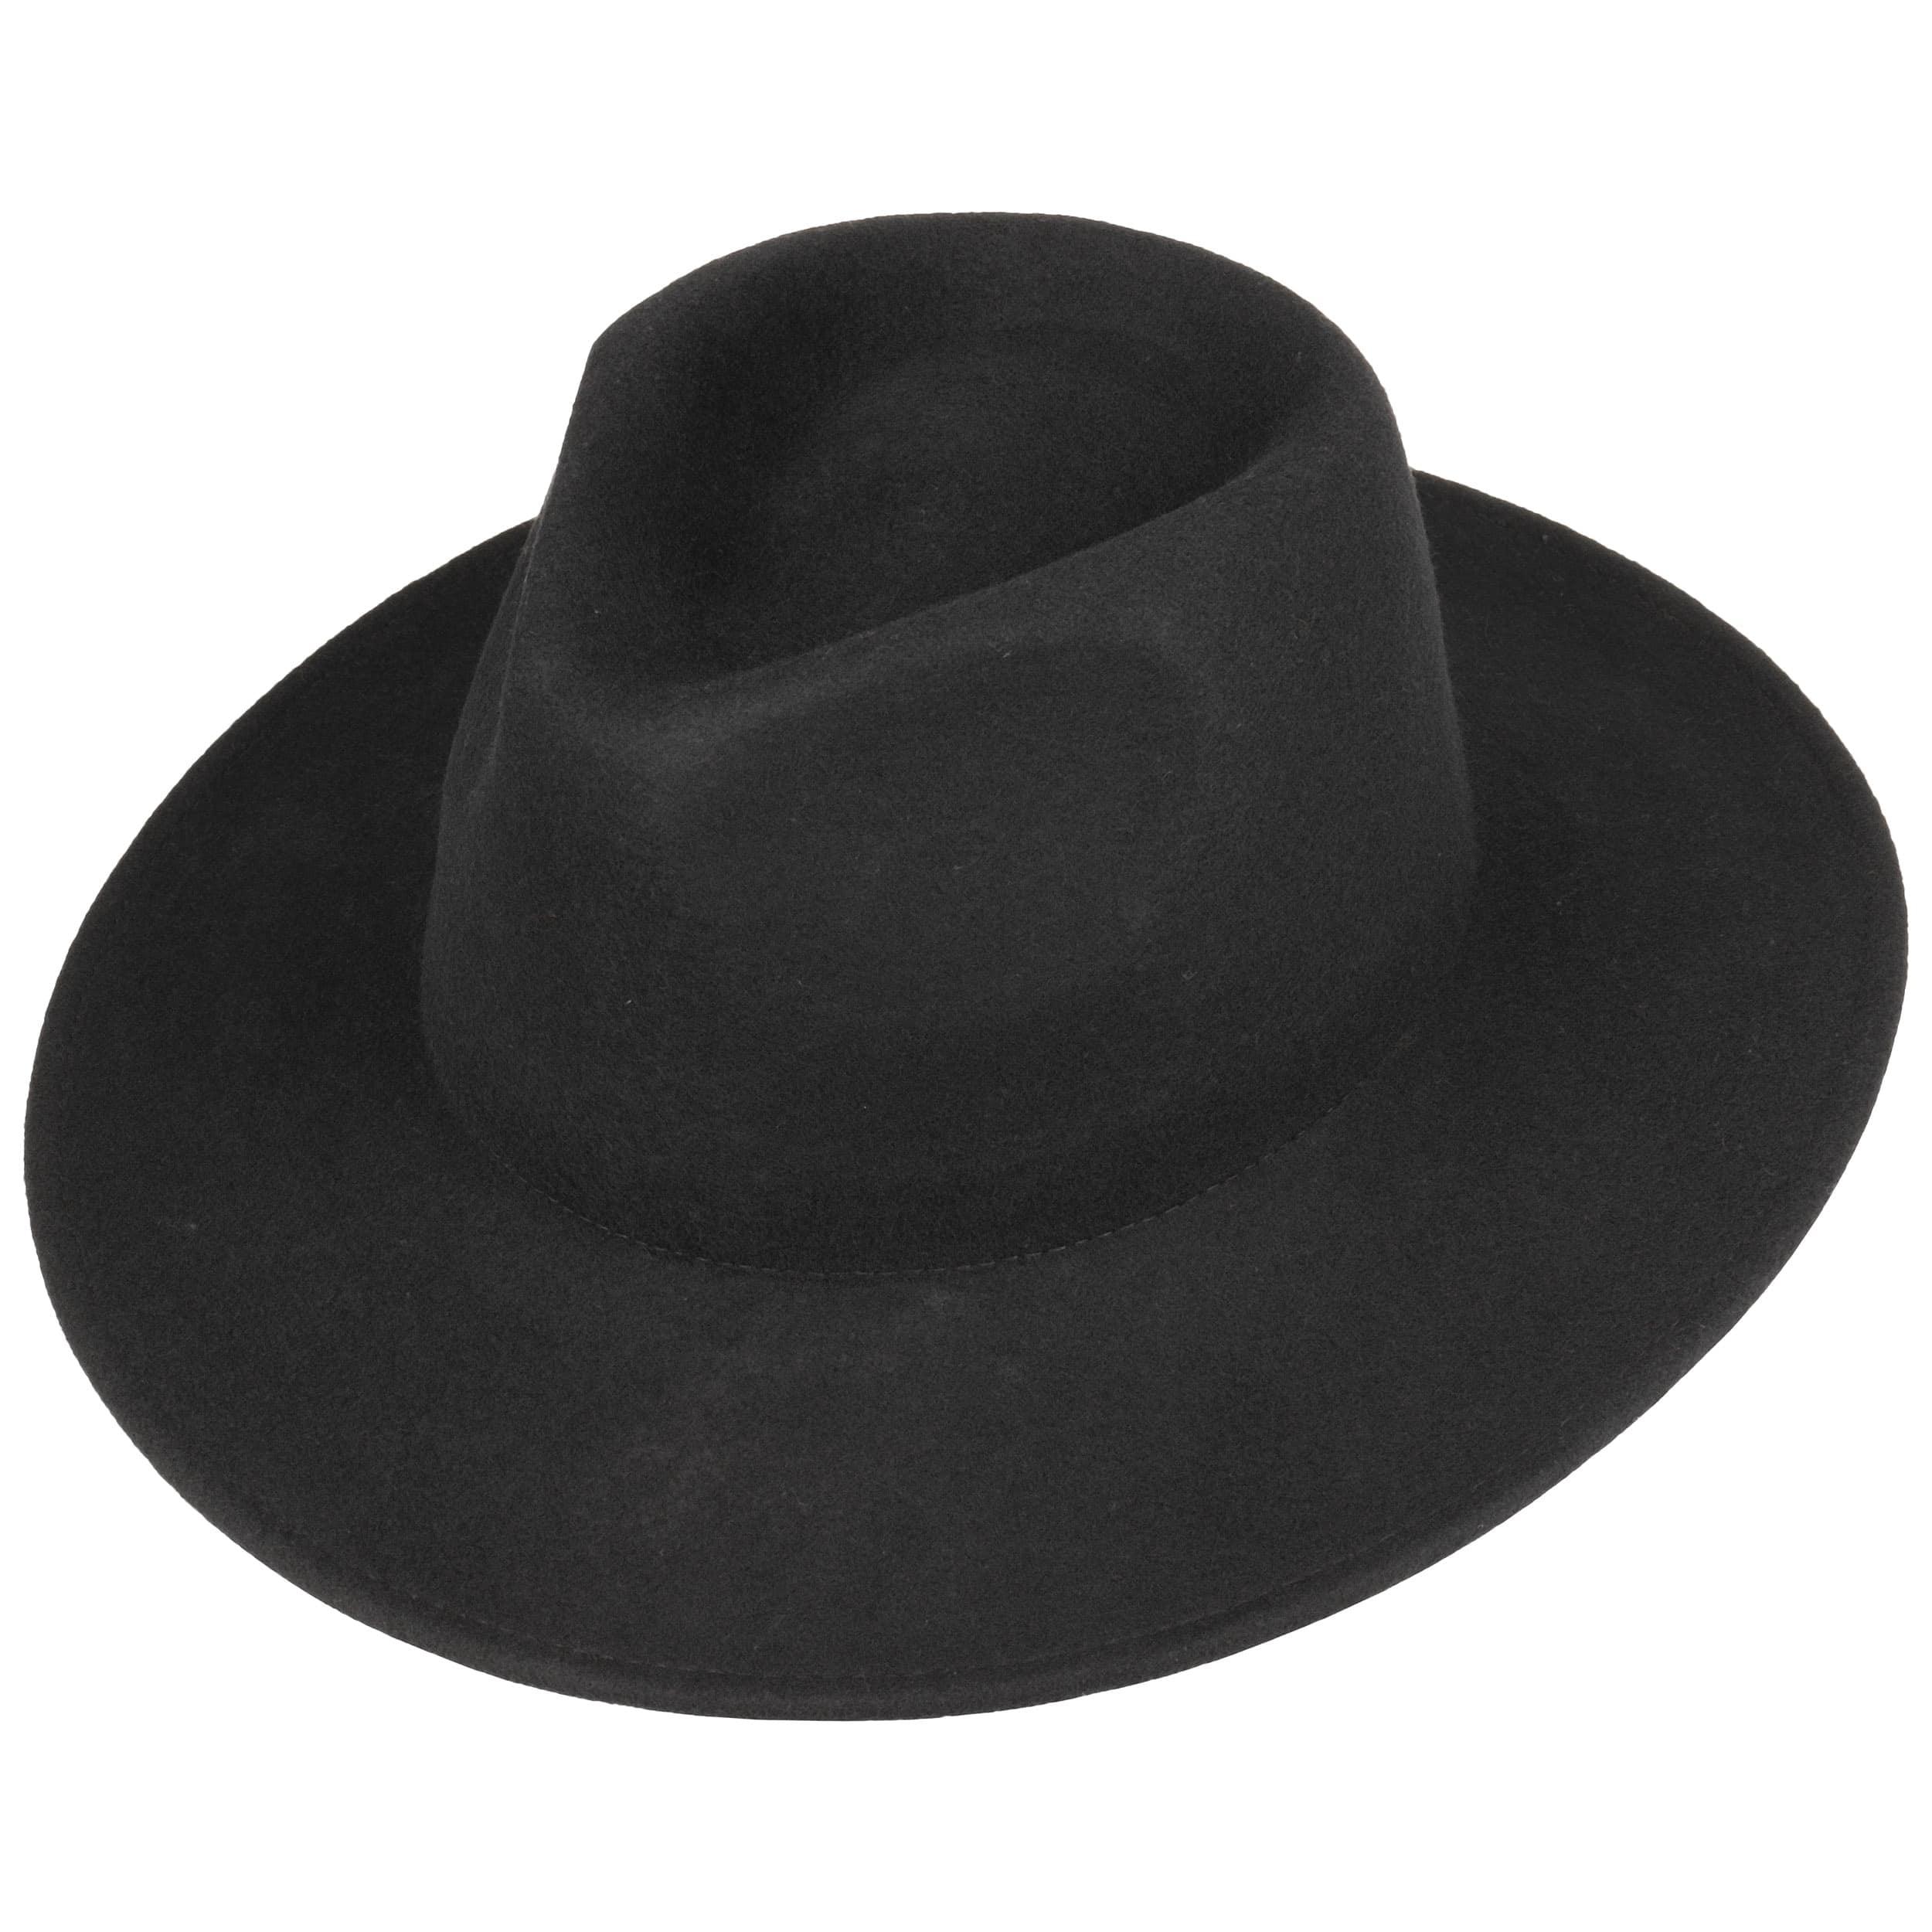 Big Brim Fedora Felt Hat by Levi´s - black 1 ... 167c9b2f385